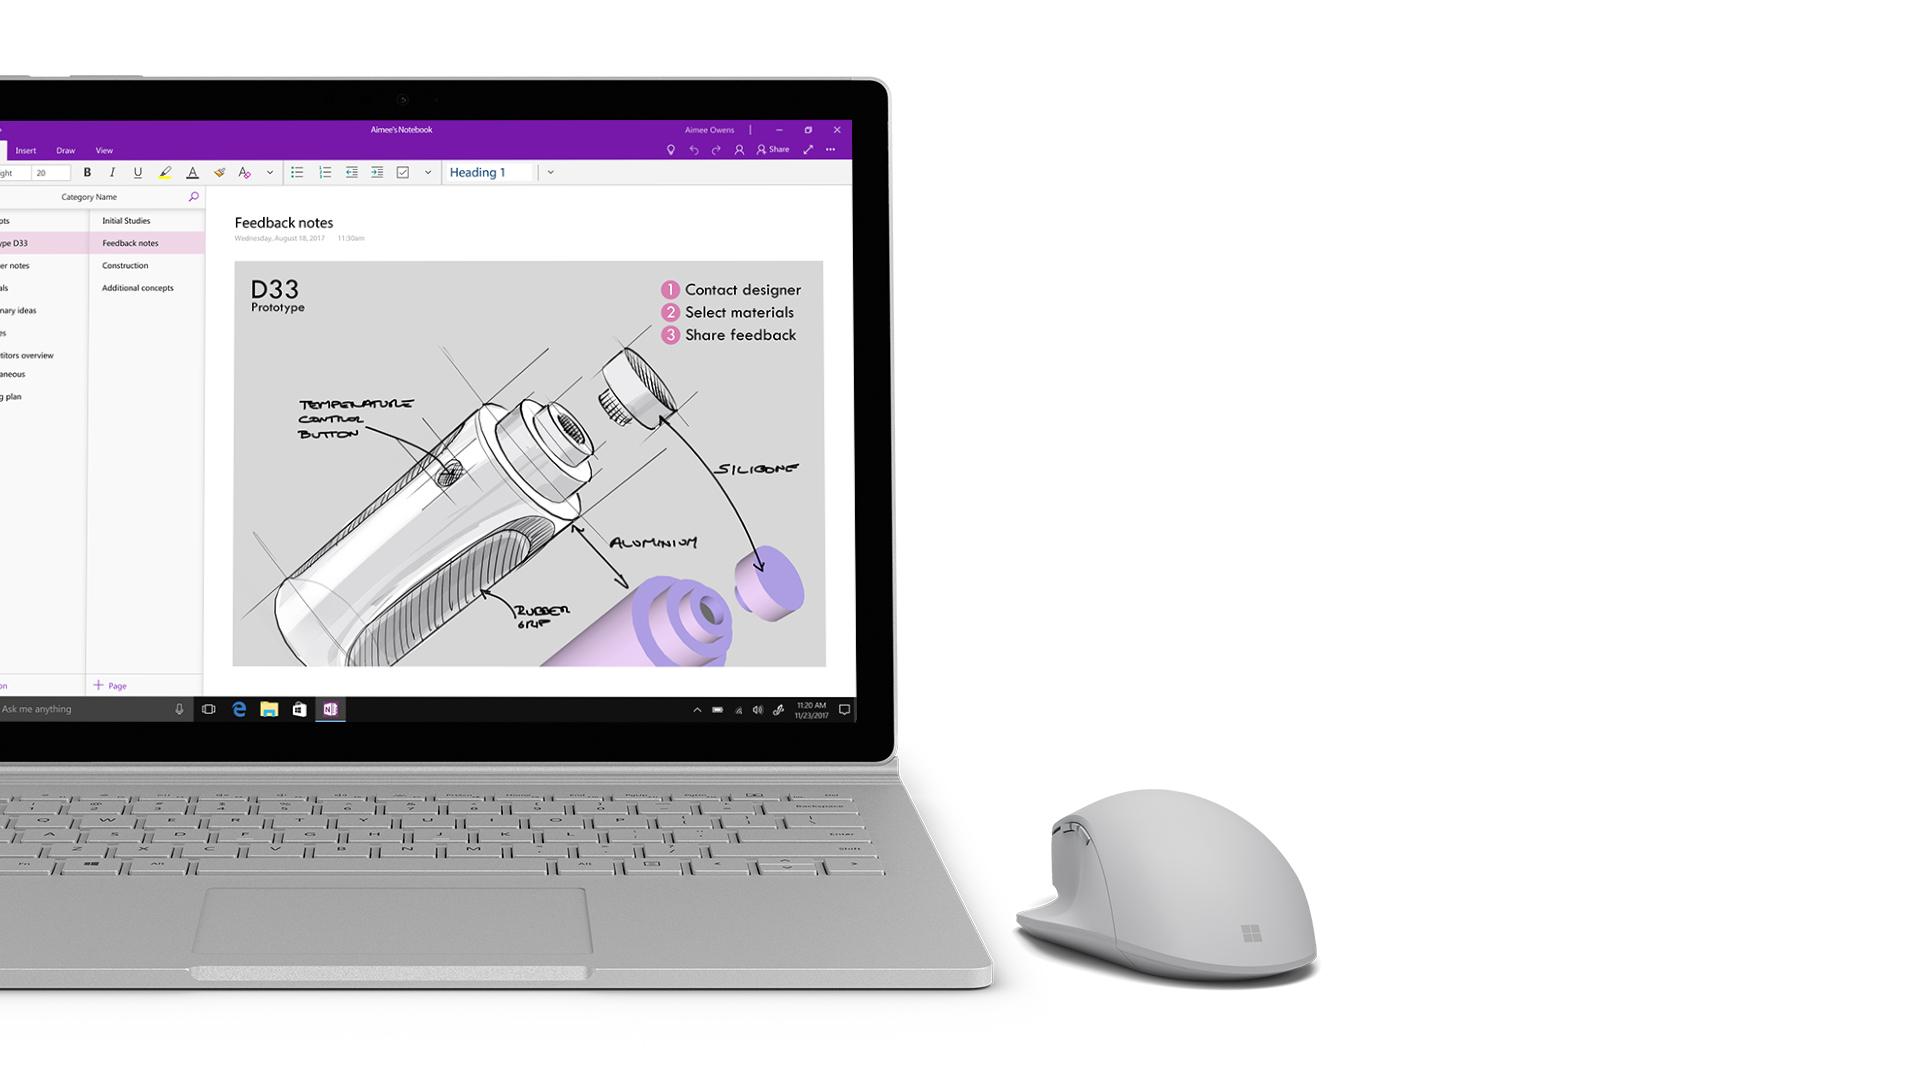 Surface 显示 OneNote 屏幕截图。